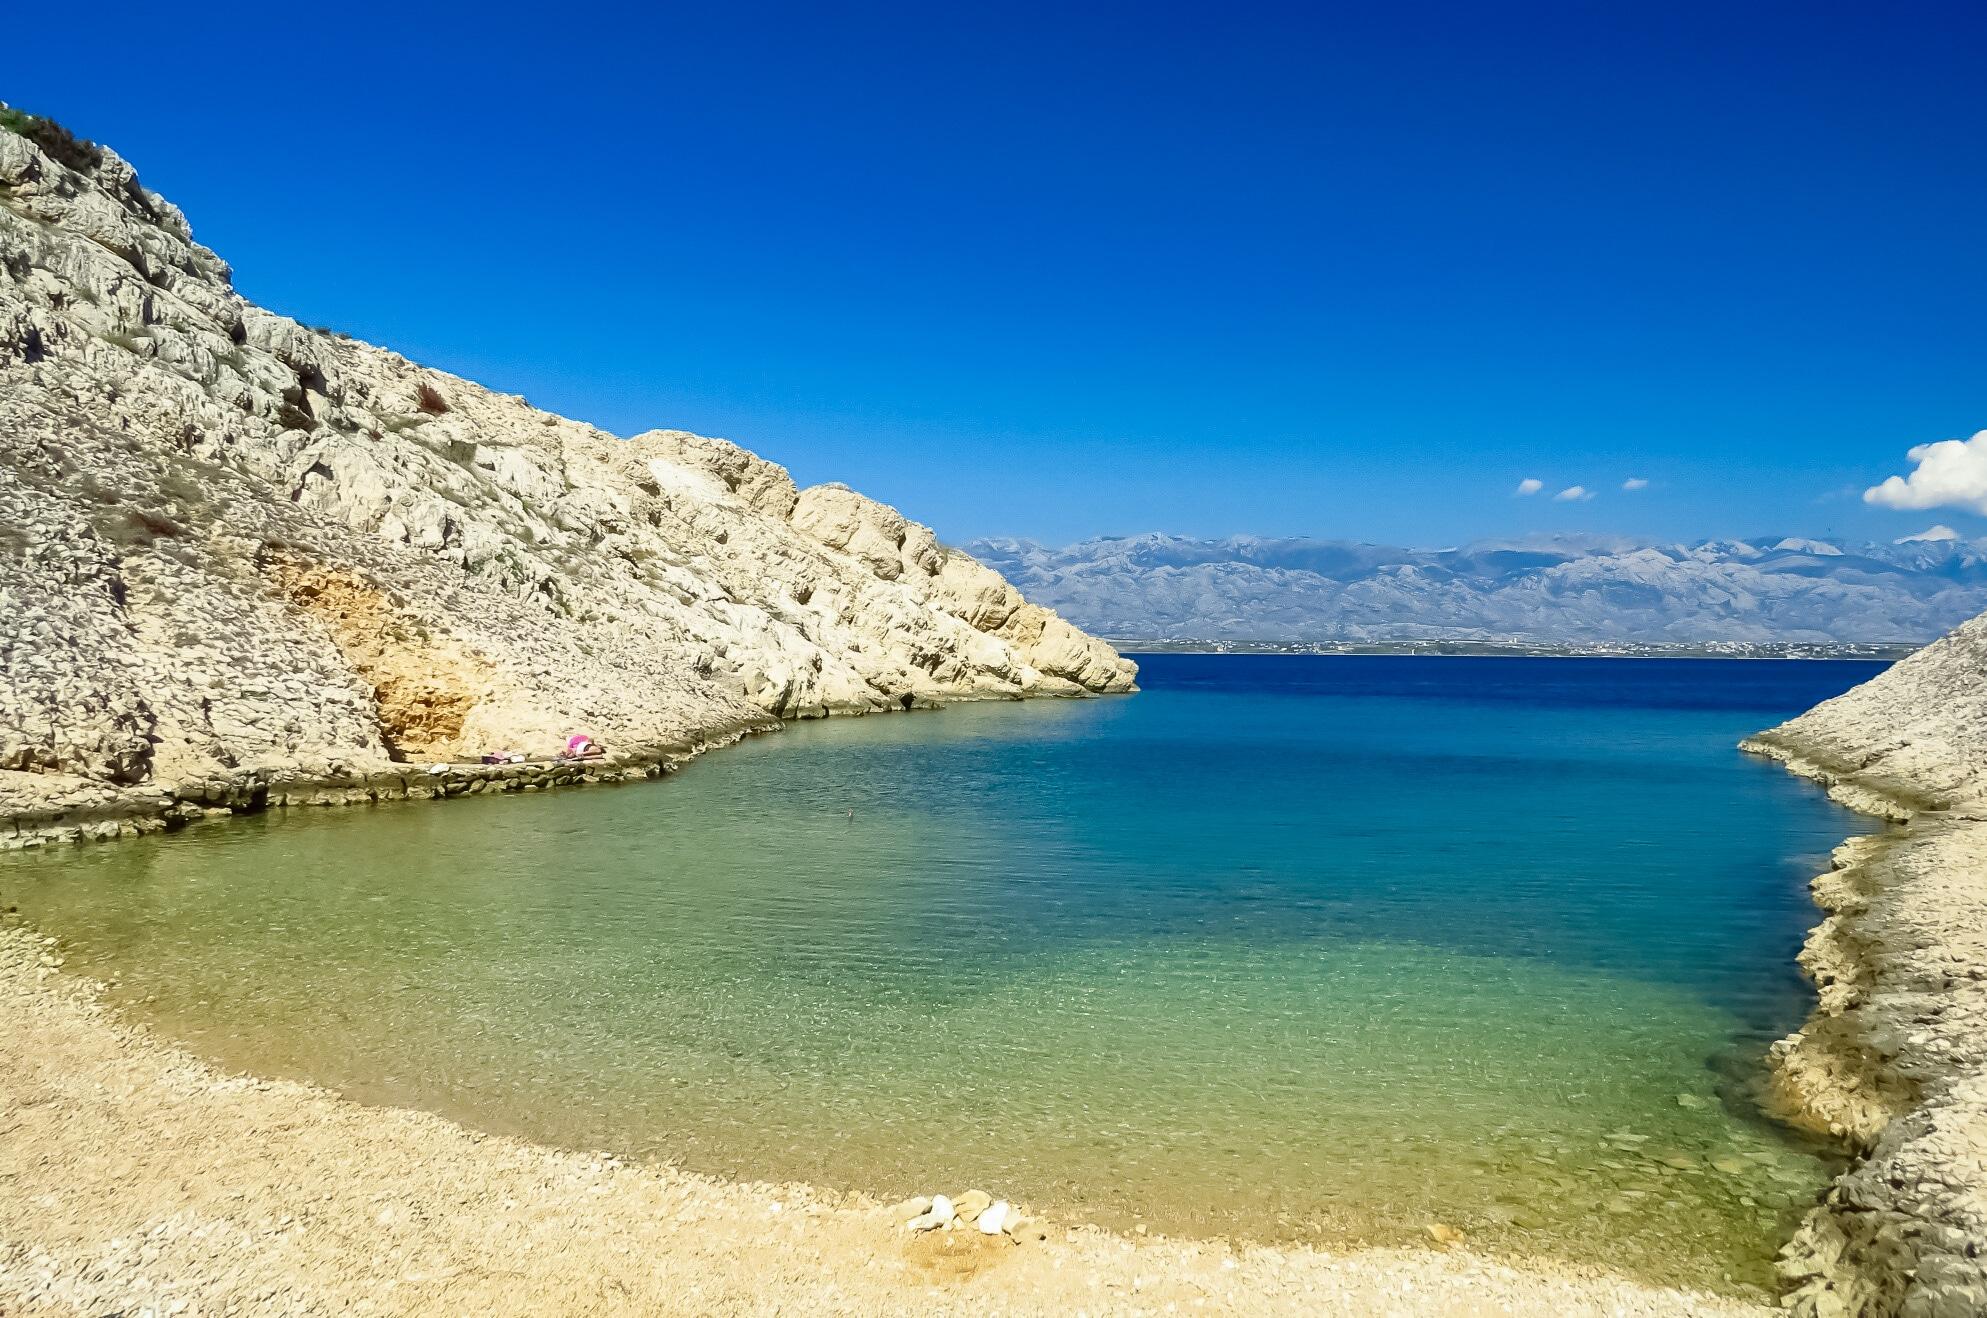 kroatija zadar zadaras papludimys